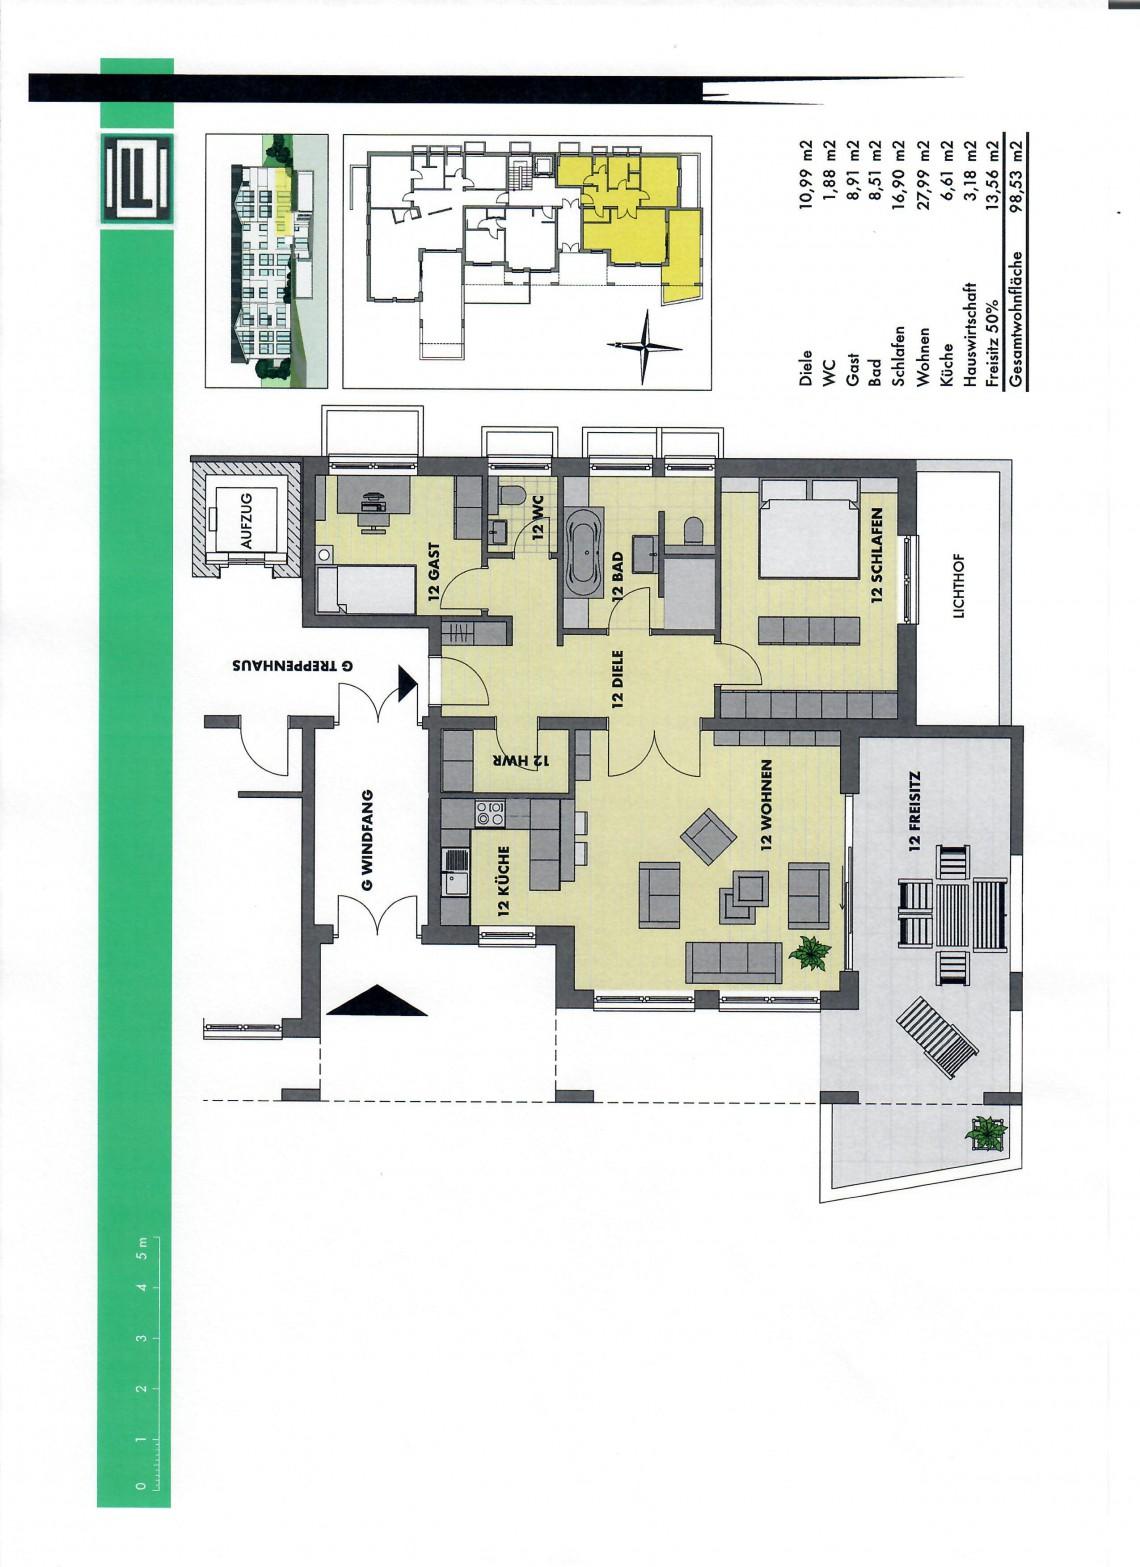 Haus 2 Whg. 12